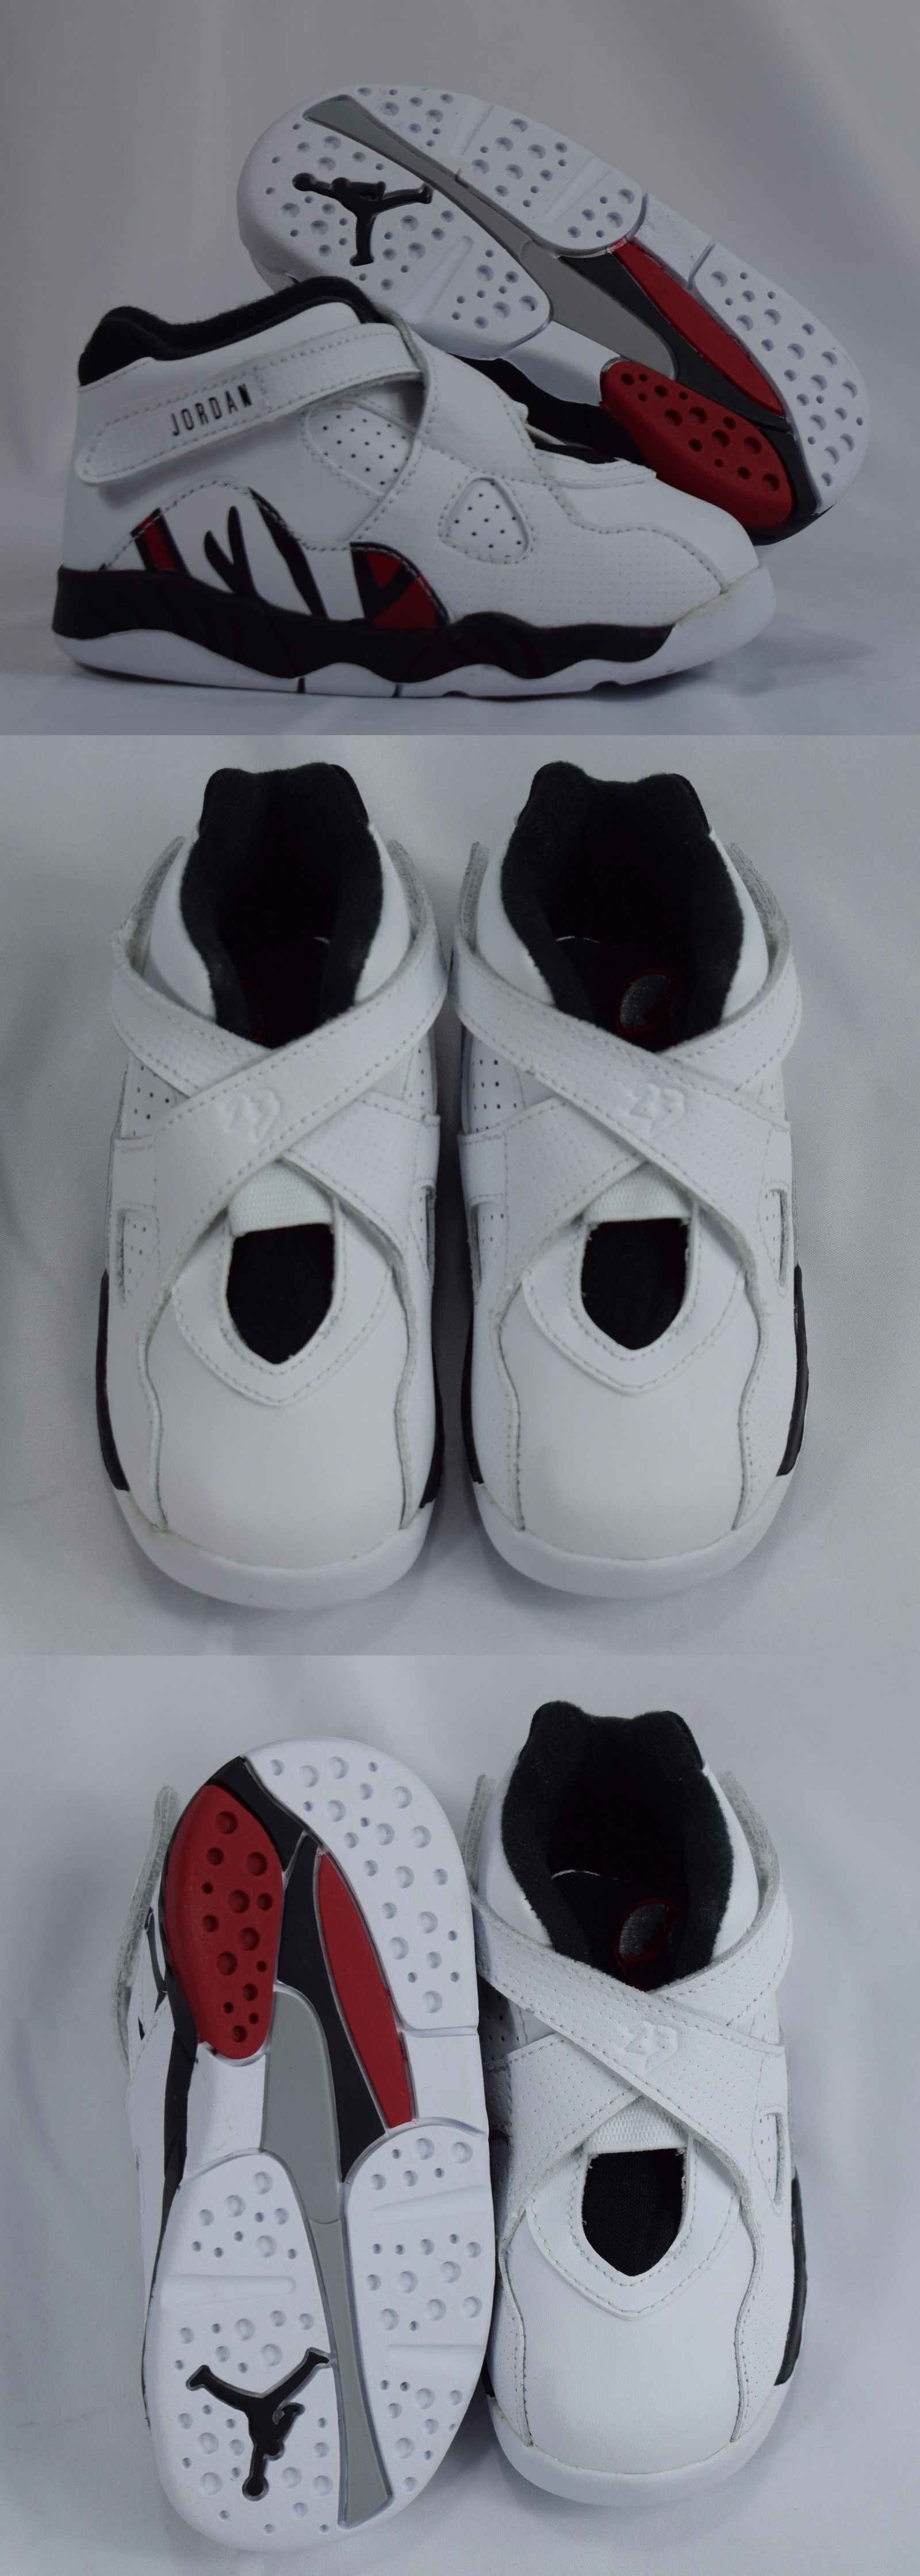 Baby Shoes 147285: Nike Jordan 8 Retro Bt 305360 104 White